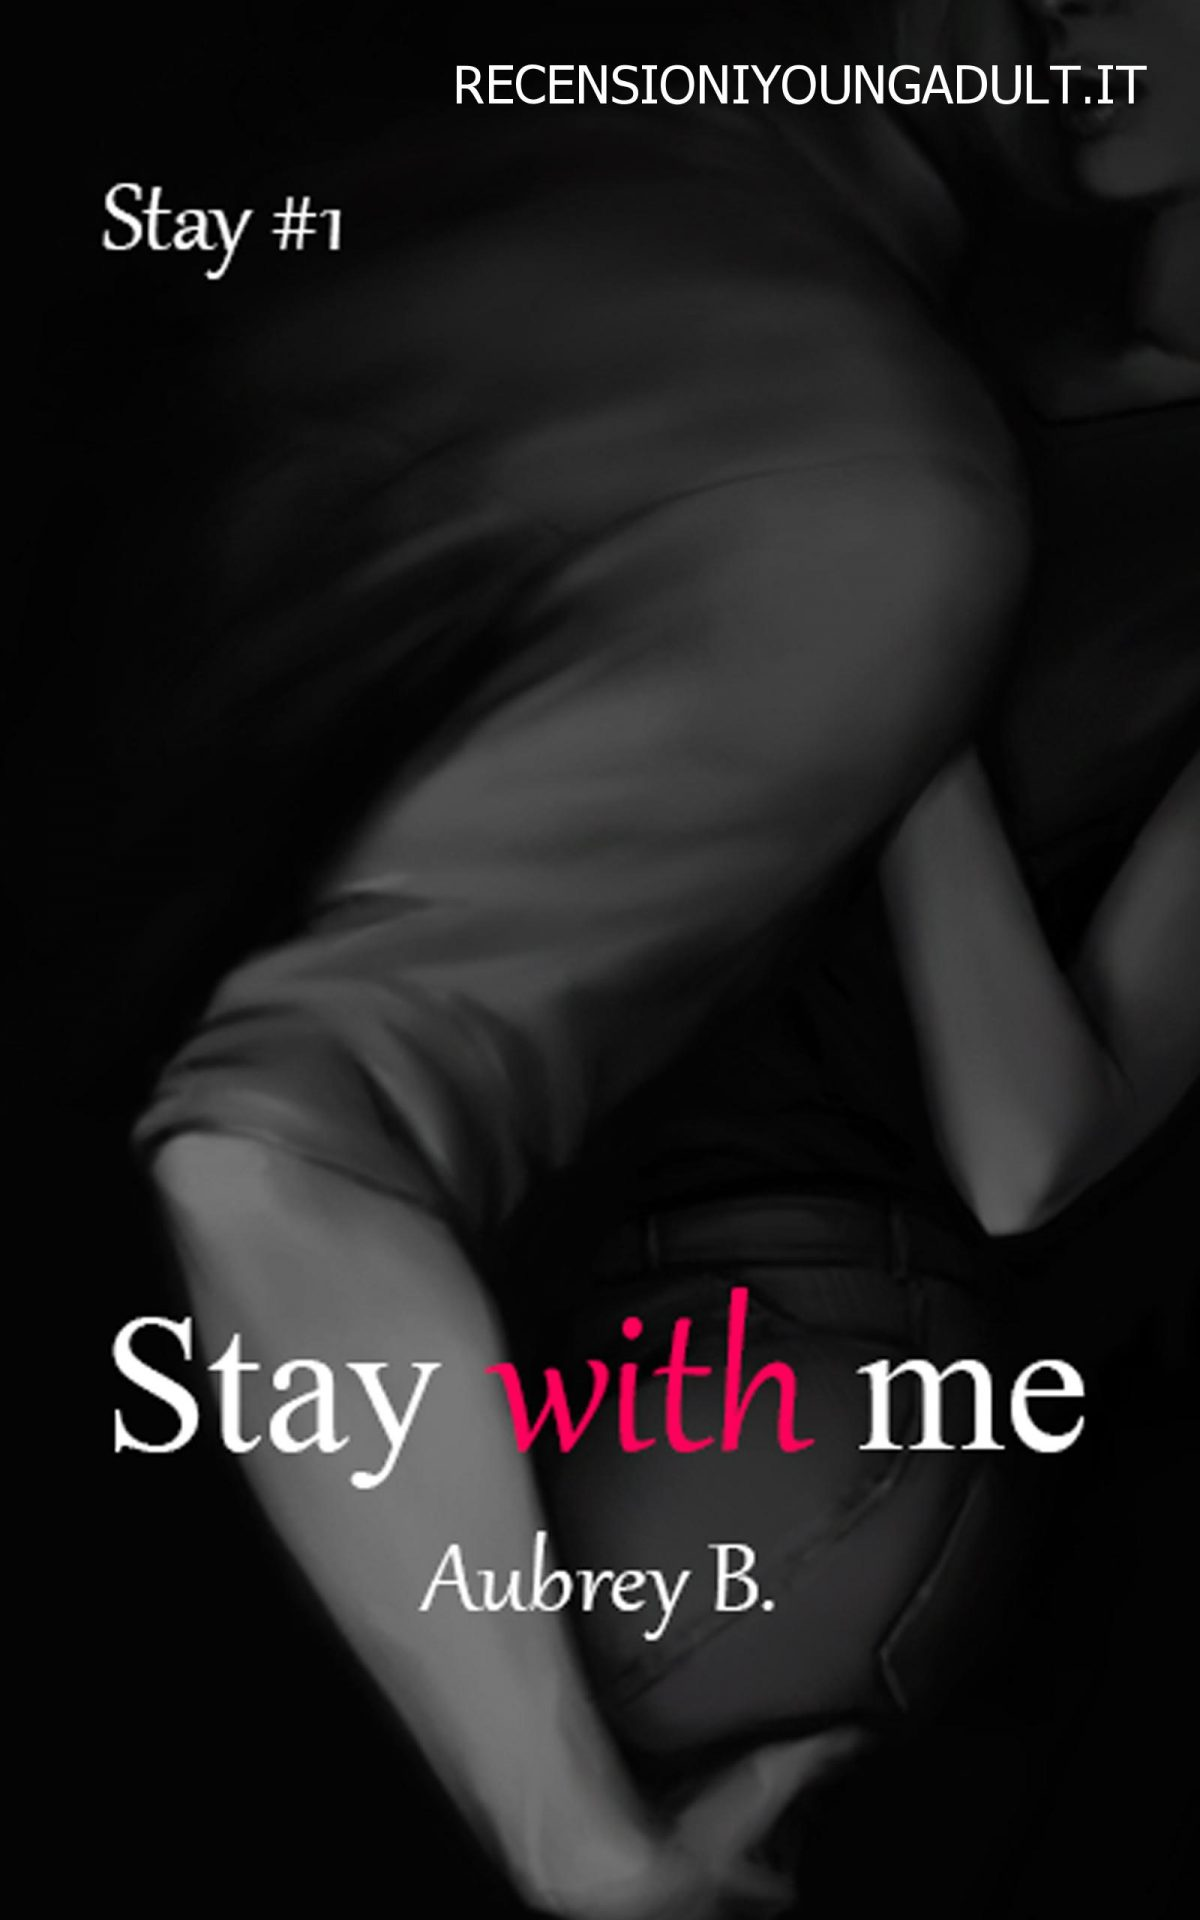 STAY WITH ME – Aubrey B., RECENSIONE ANTEPRIMA